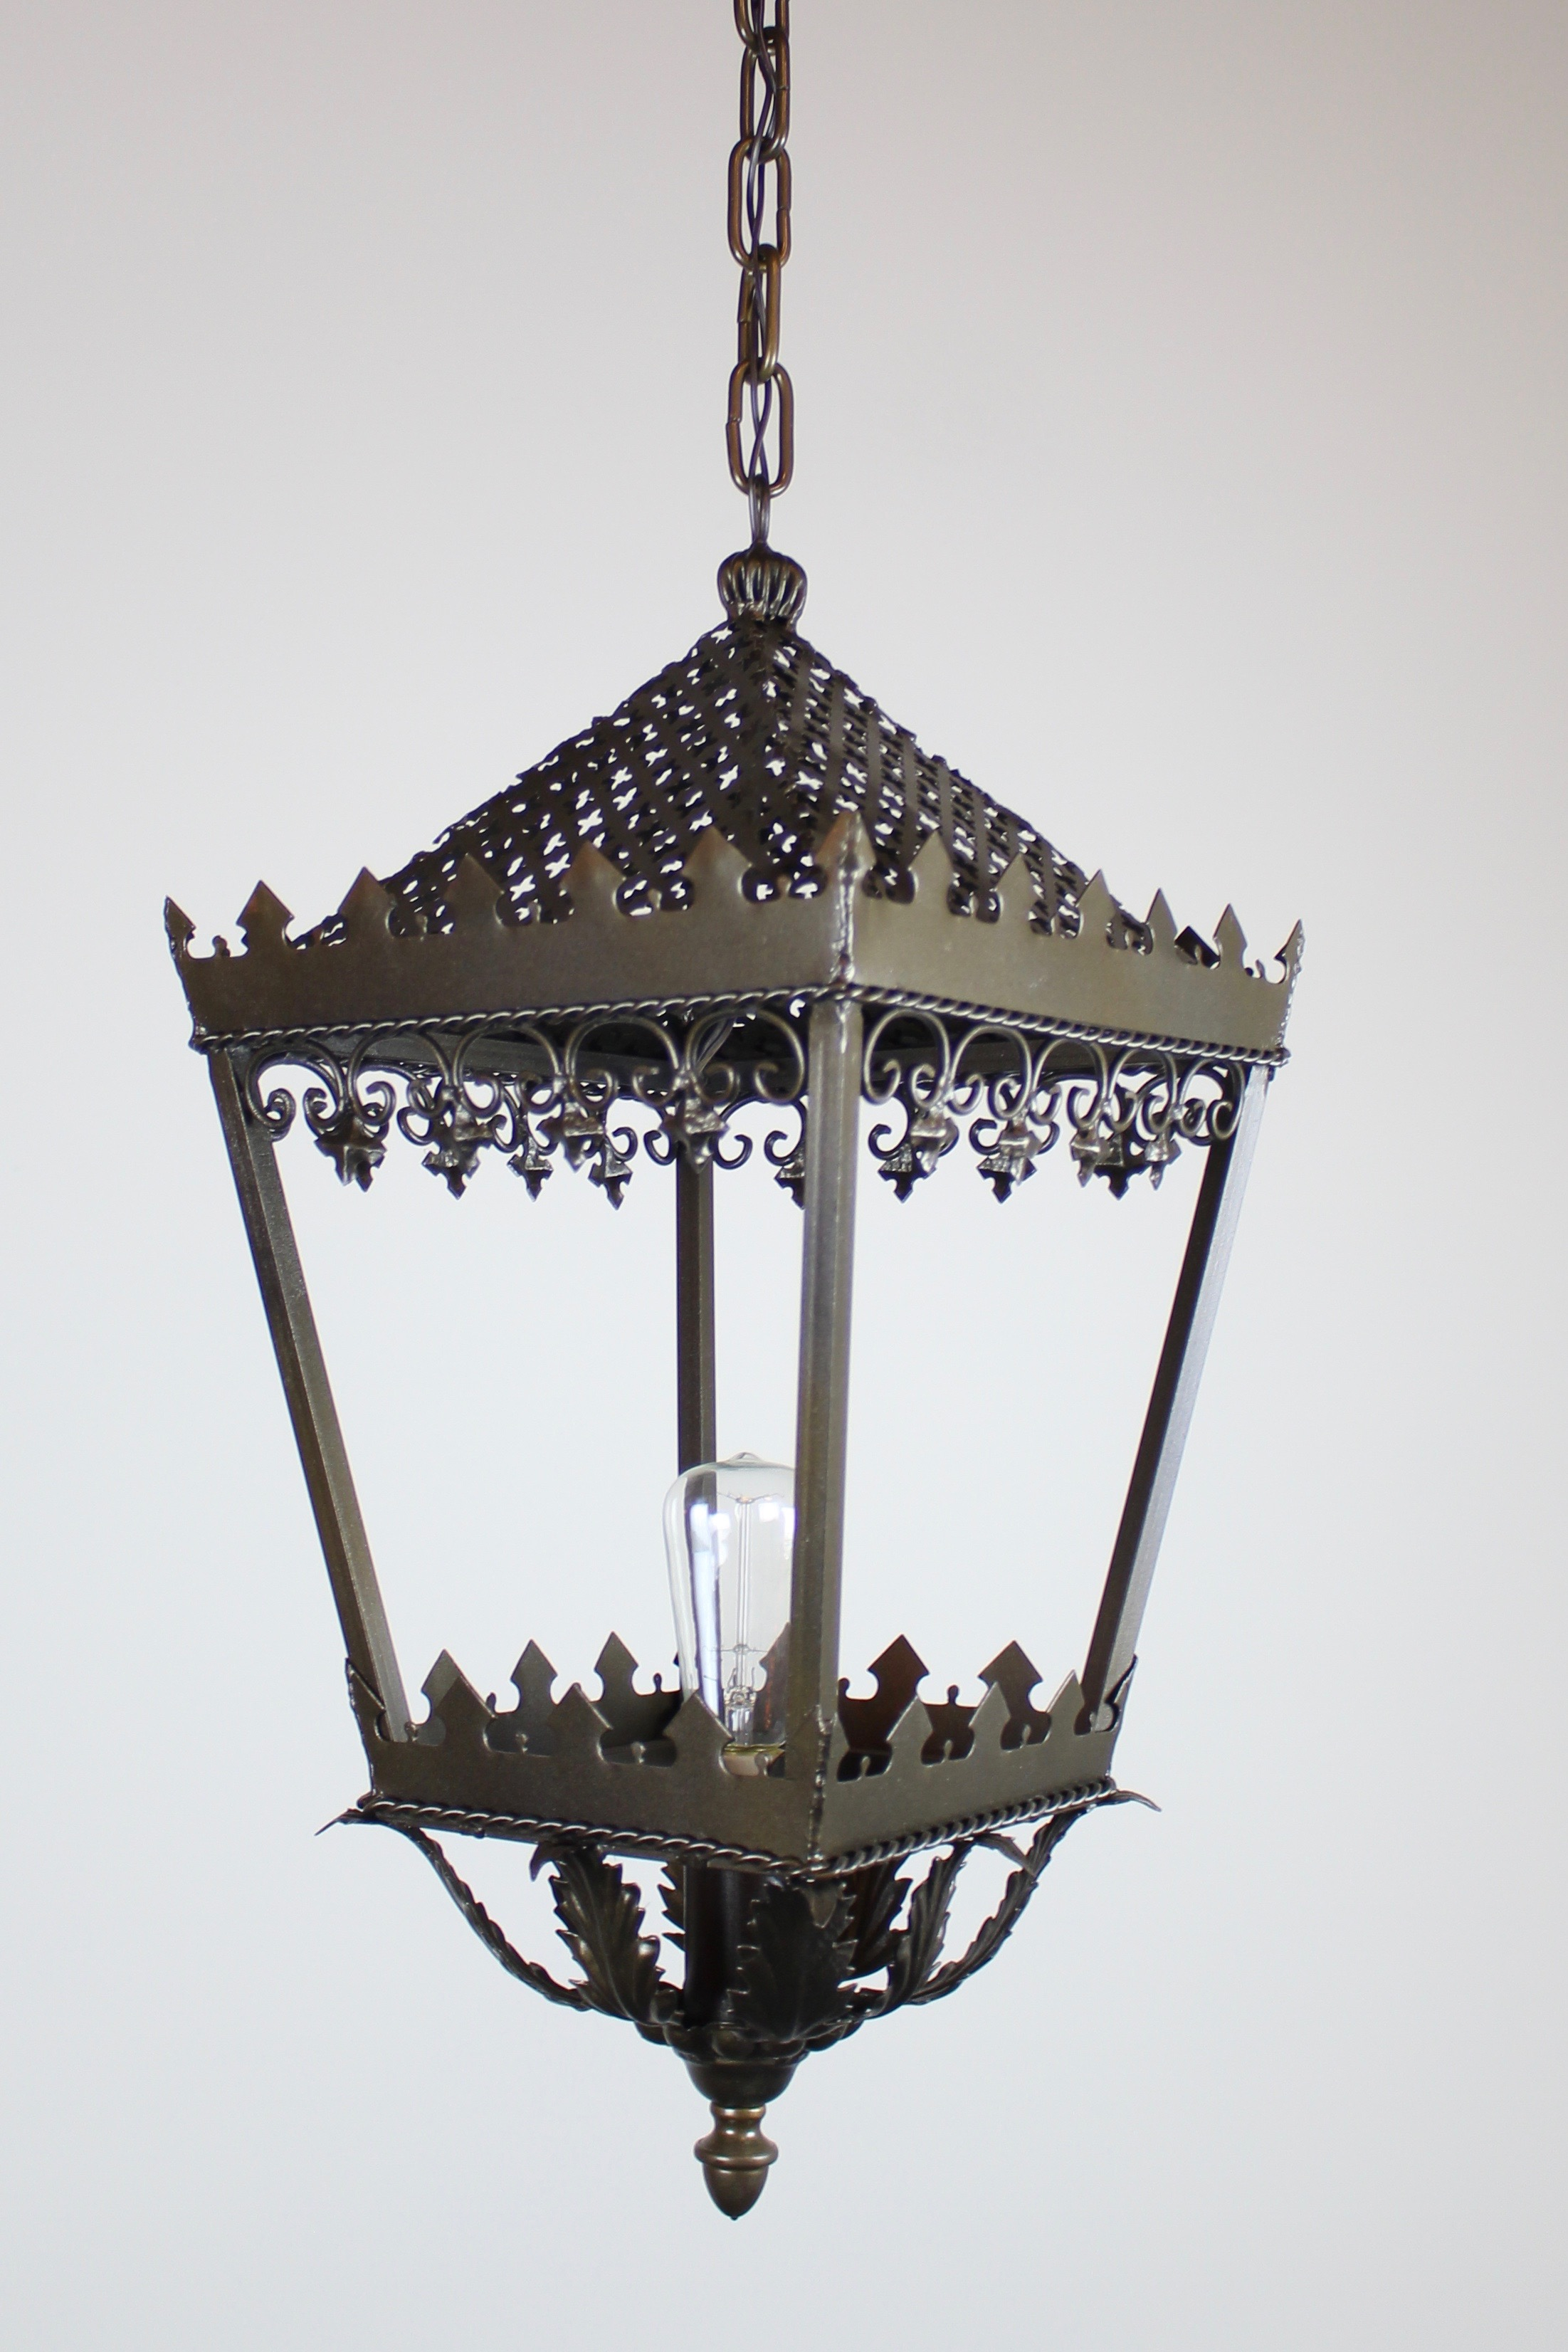 gothic style lighting. see gothic style lighting t